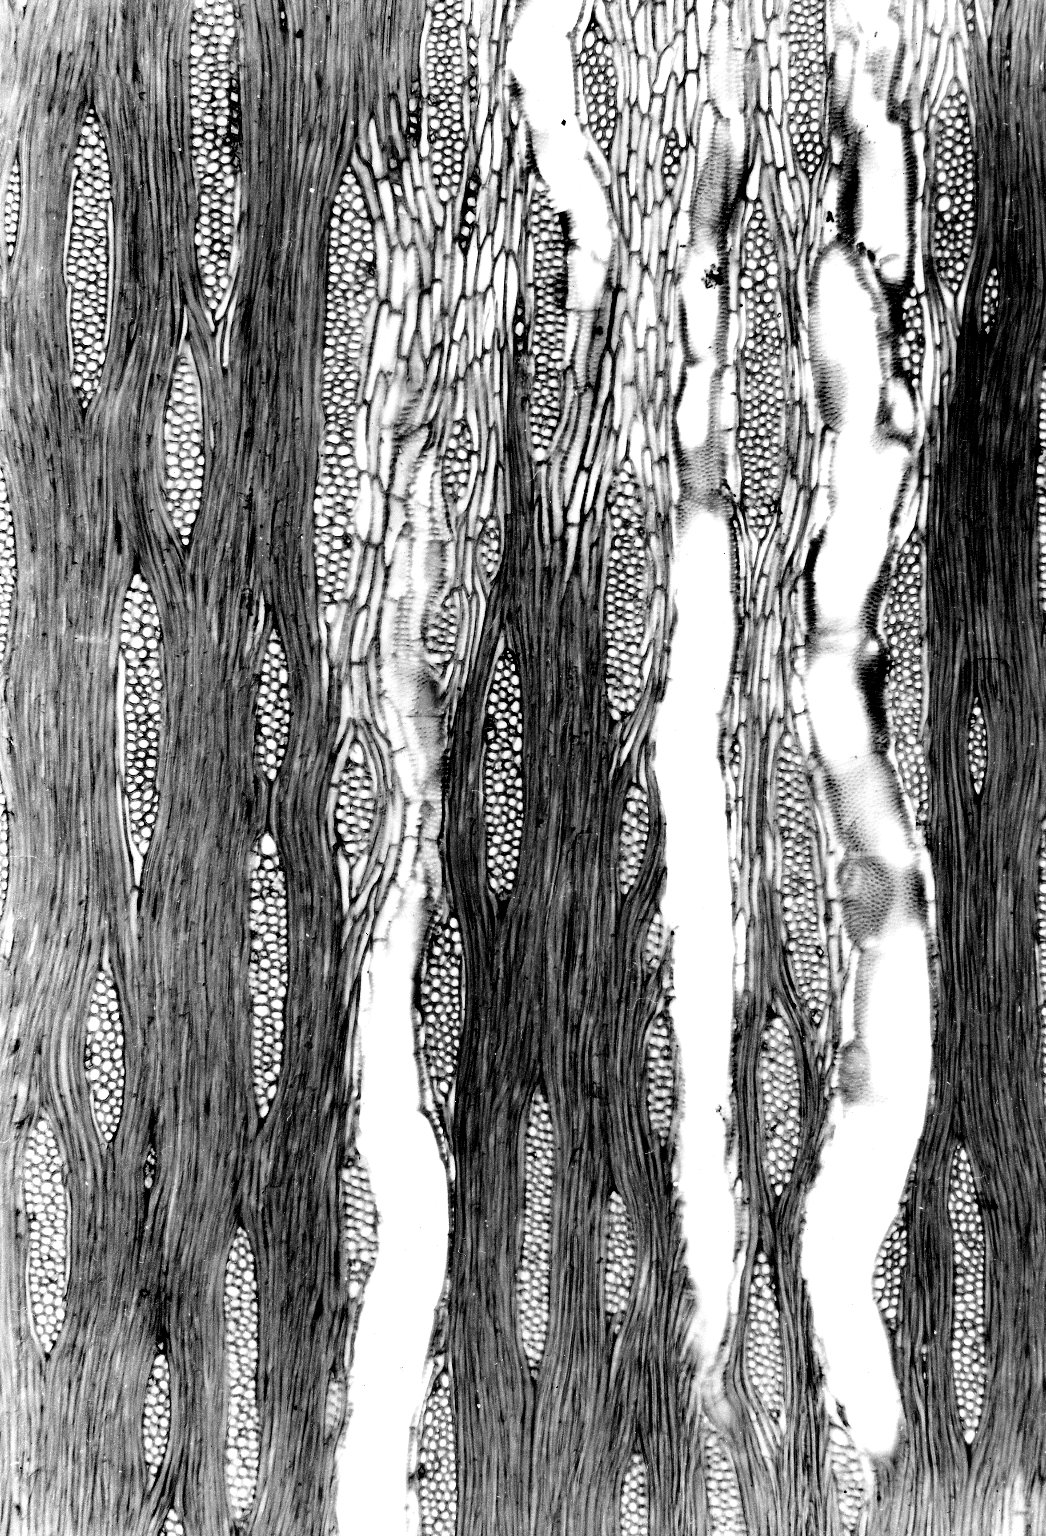 LEGUMINOSAE CAESALPINIOIDEAE Mimosoid Clade Alantsilodendron pilosum